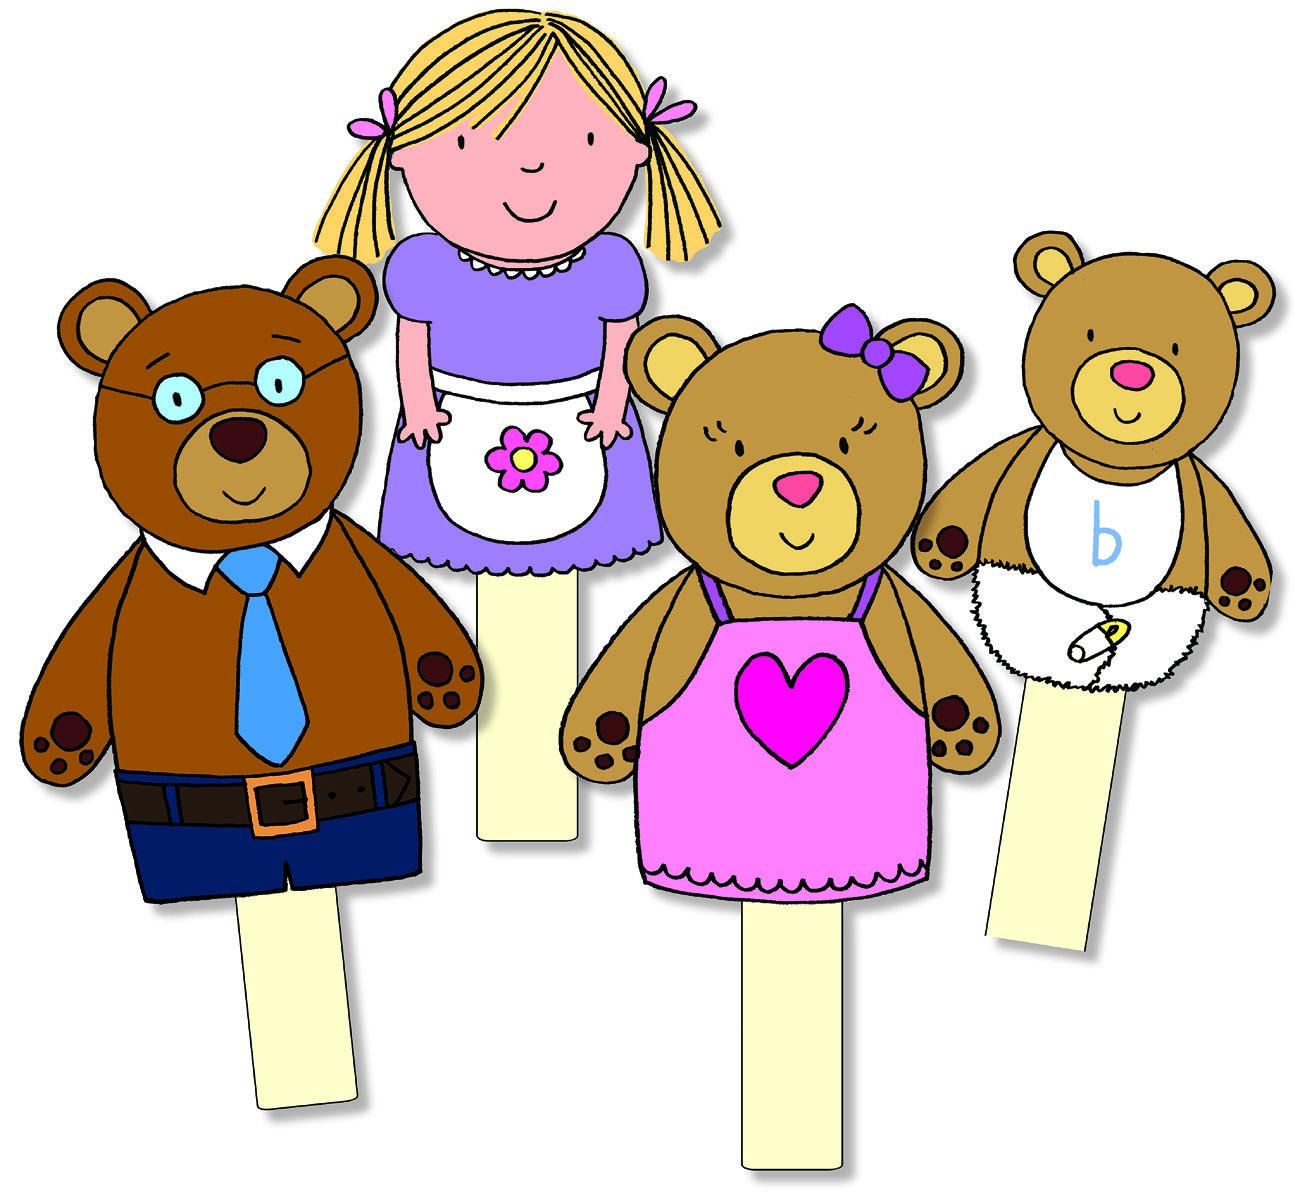 Goldilocks And The Three Bears Clipart at GetDrawings.com.